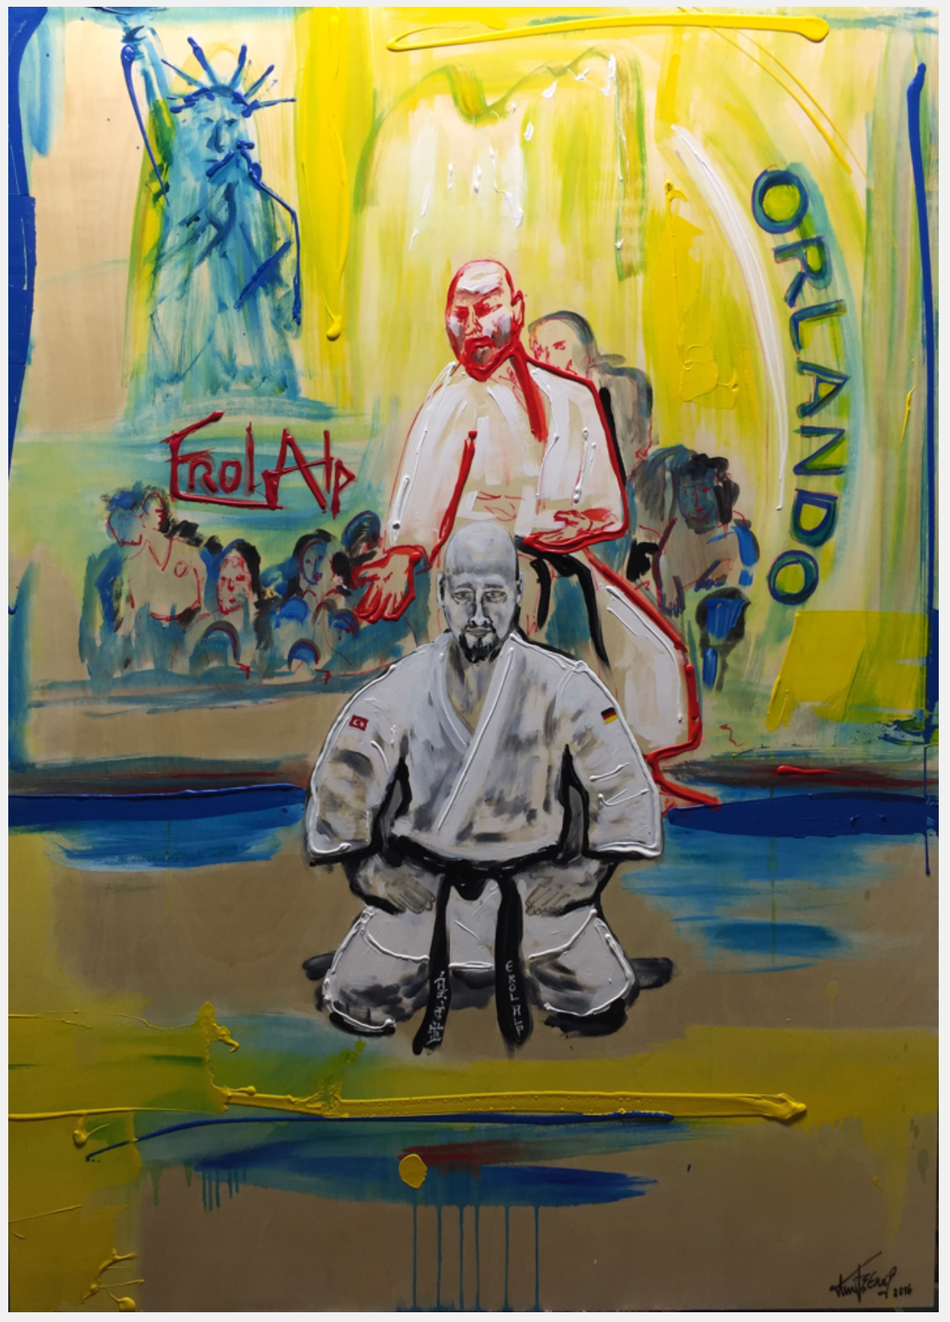 Eine Hommage des Künstlers Bernd Knibernig an den Kampfkünstler Erol Alp